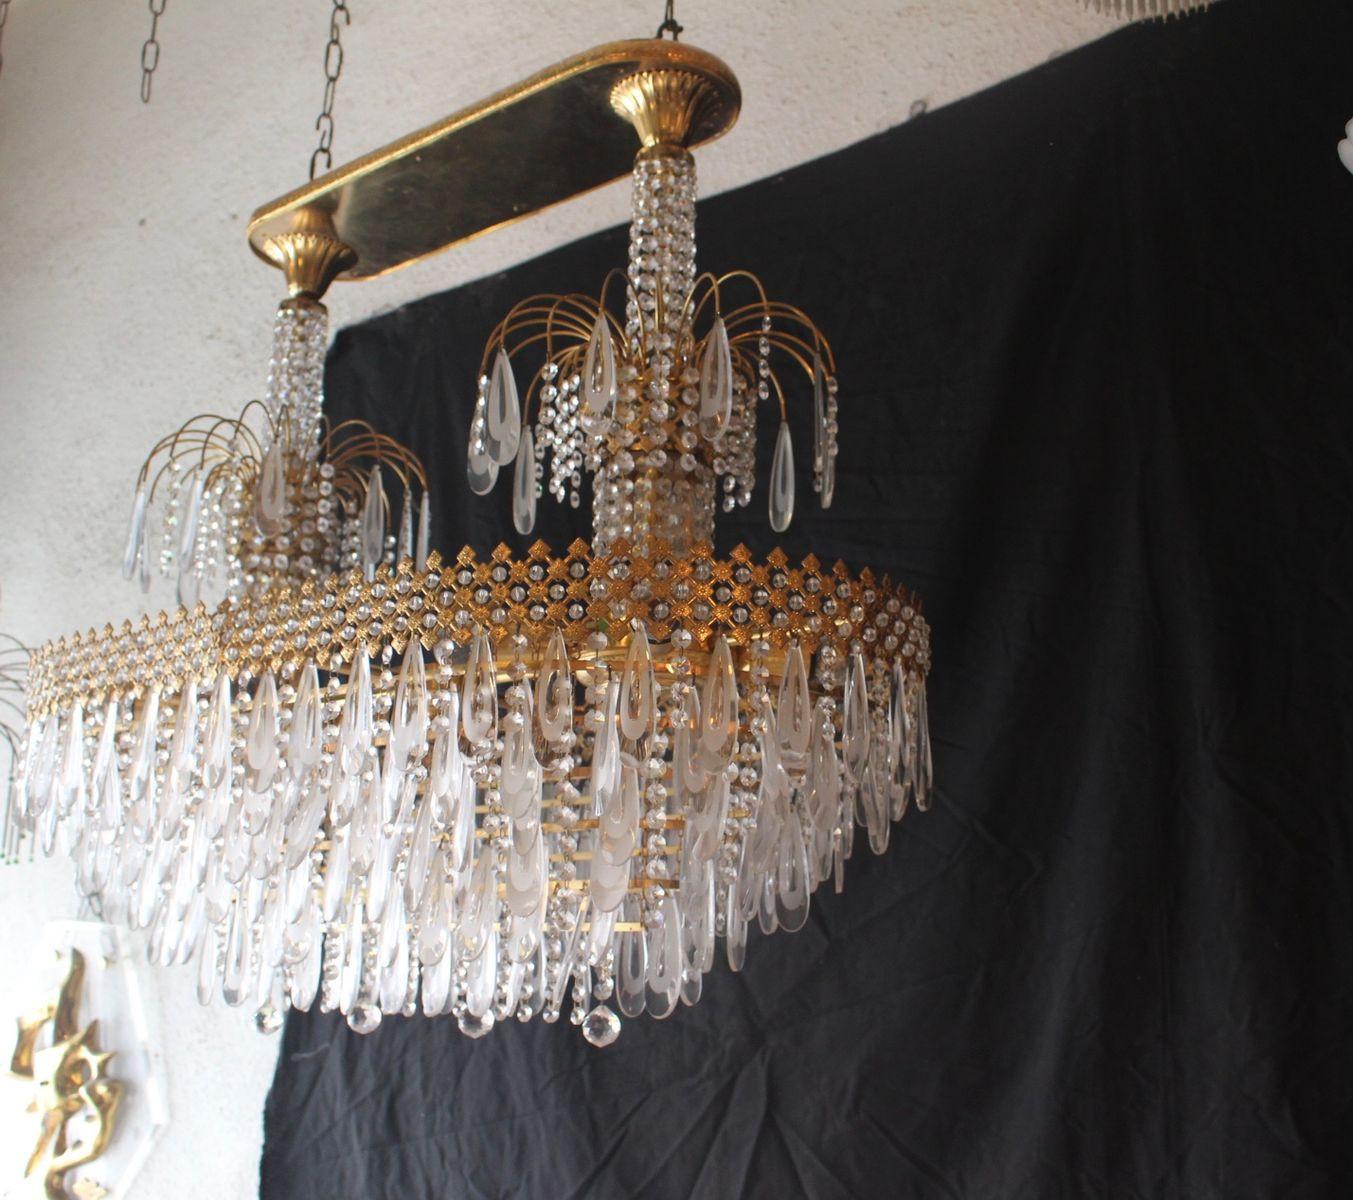 murano glass handbag vase of vintage murano glass swarovski crystal chandelier 1980s for sale throughout a7308 00